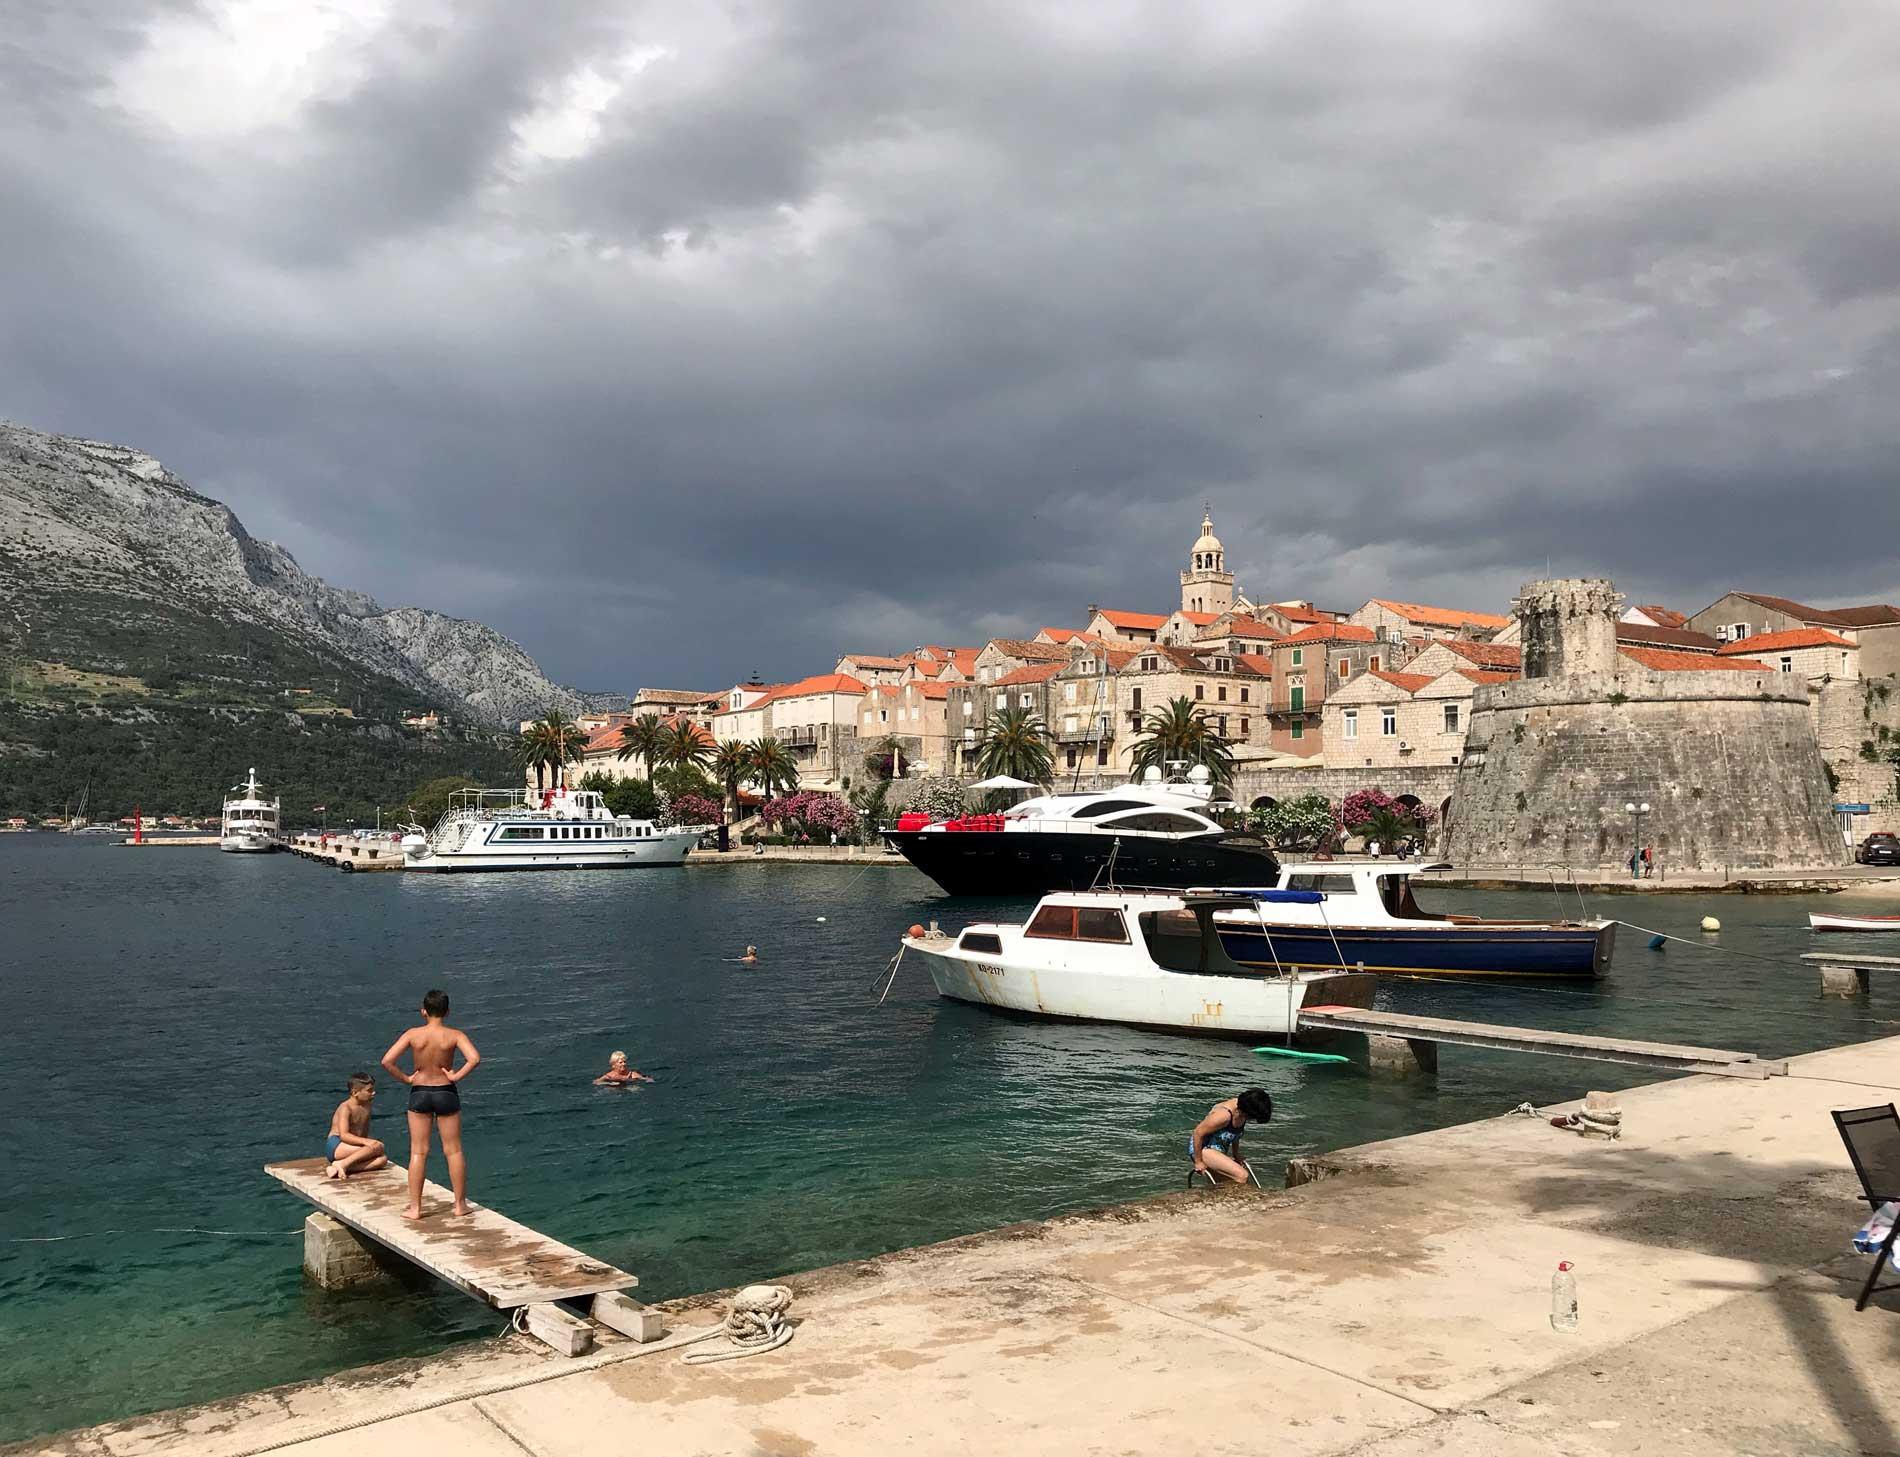 Korcula-Croazia-mare-yacht-bagnanti